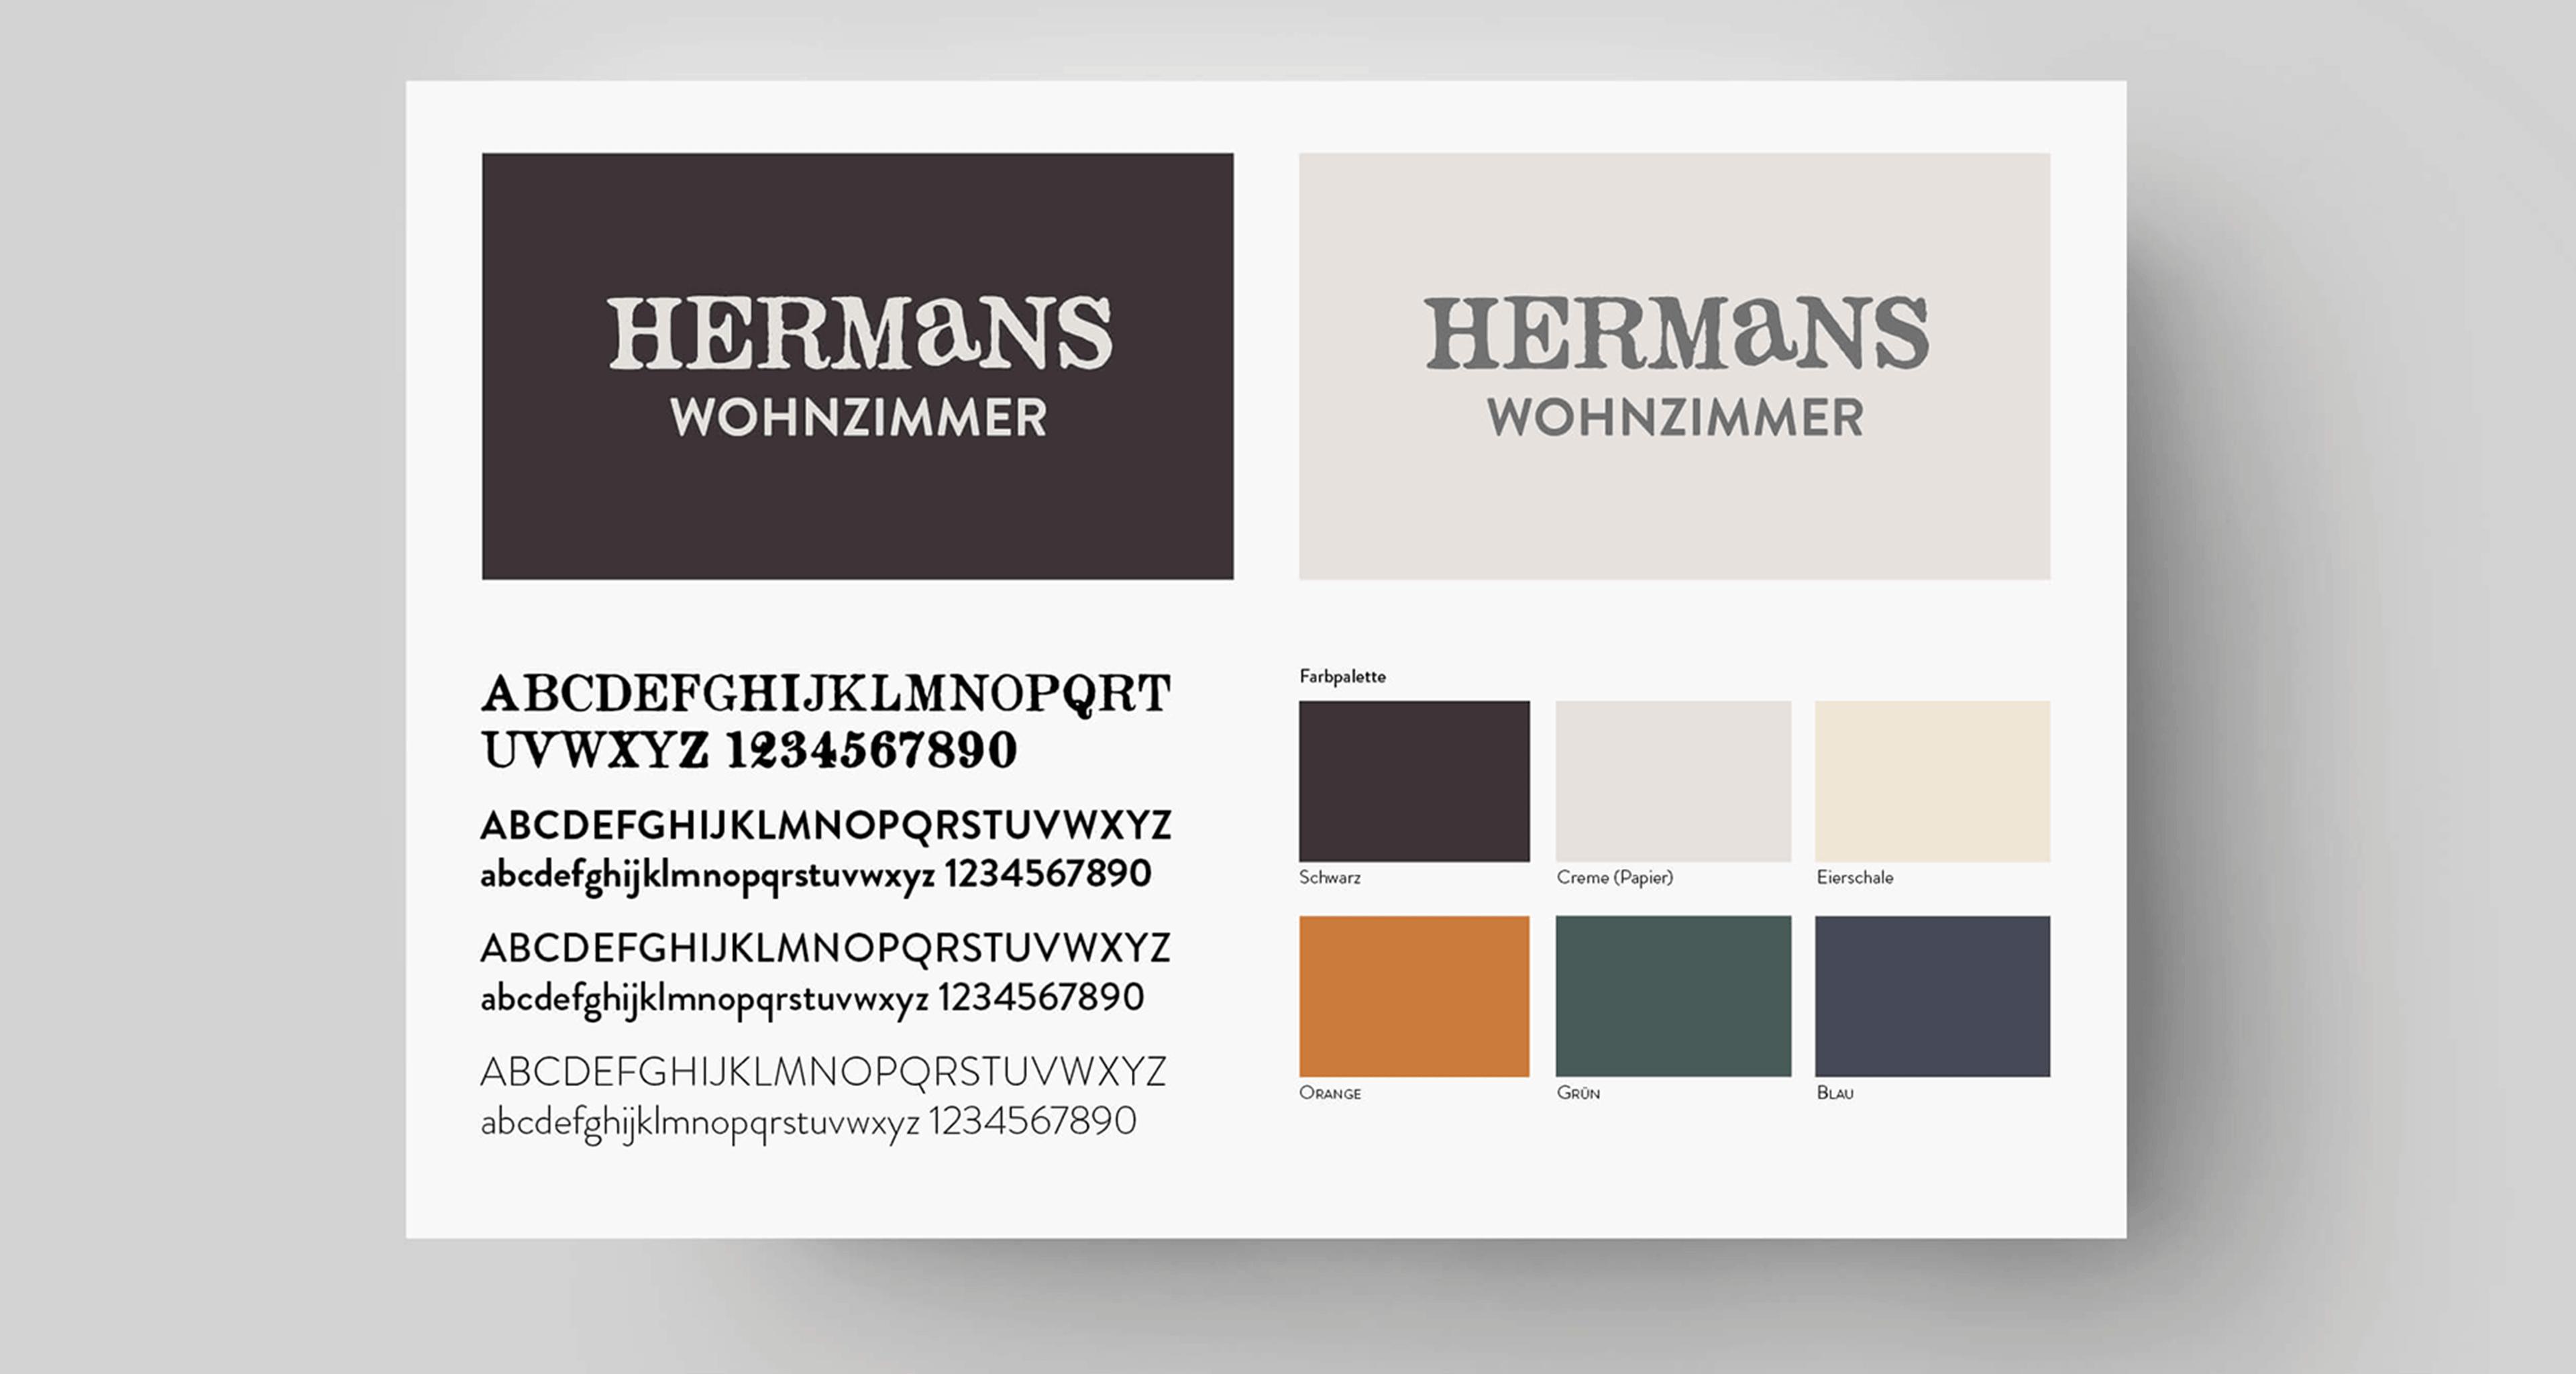 Branding_Hermans_Wohnz_3@2x